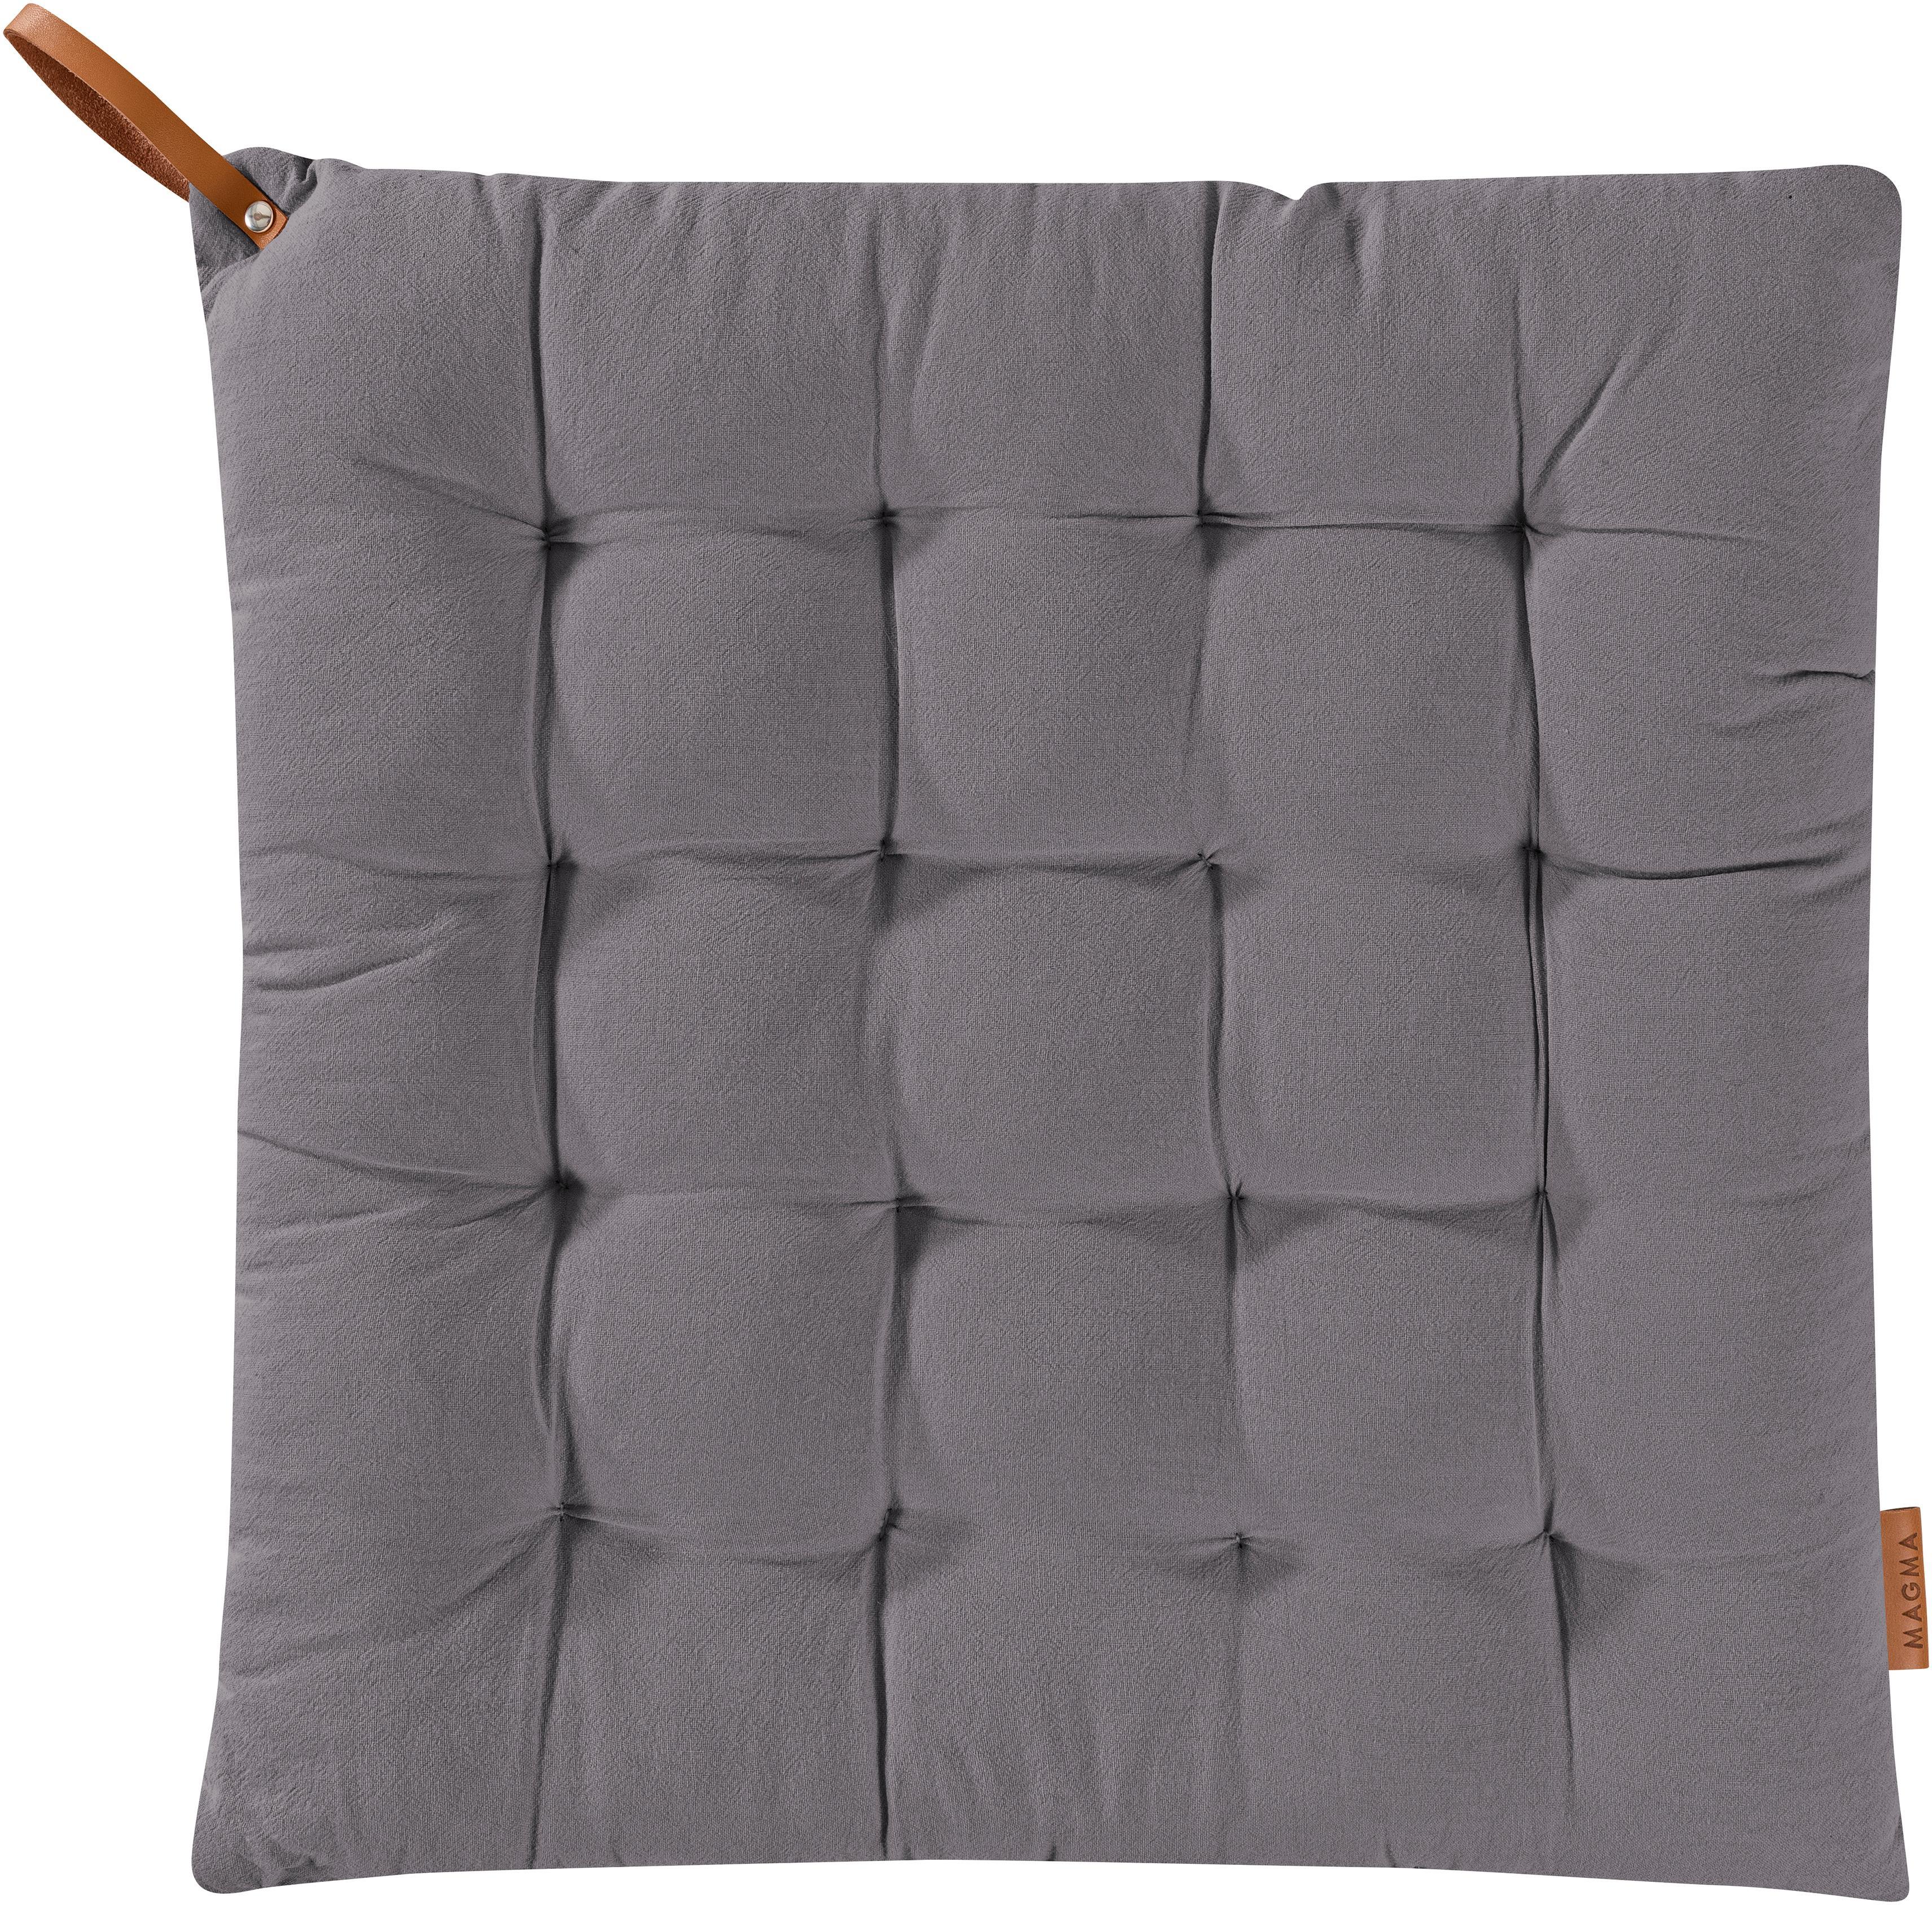 Cuscino sedia Billie, Cotone, Antracite, Larg. 40 x Lung. 40 cm